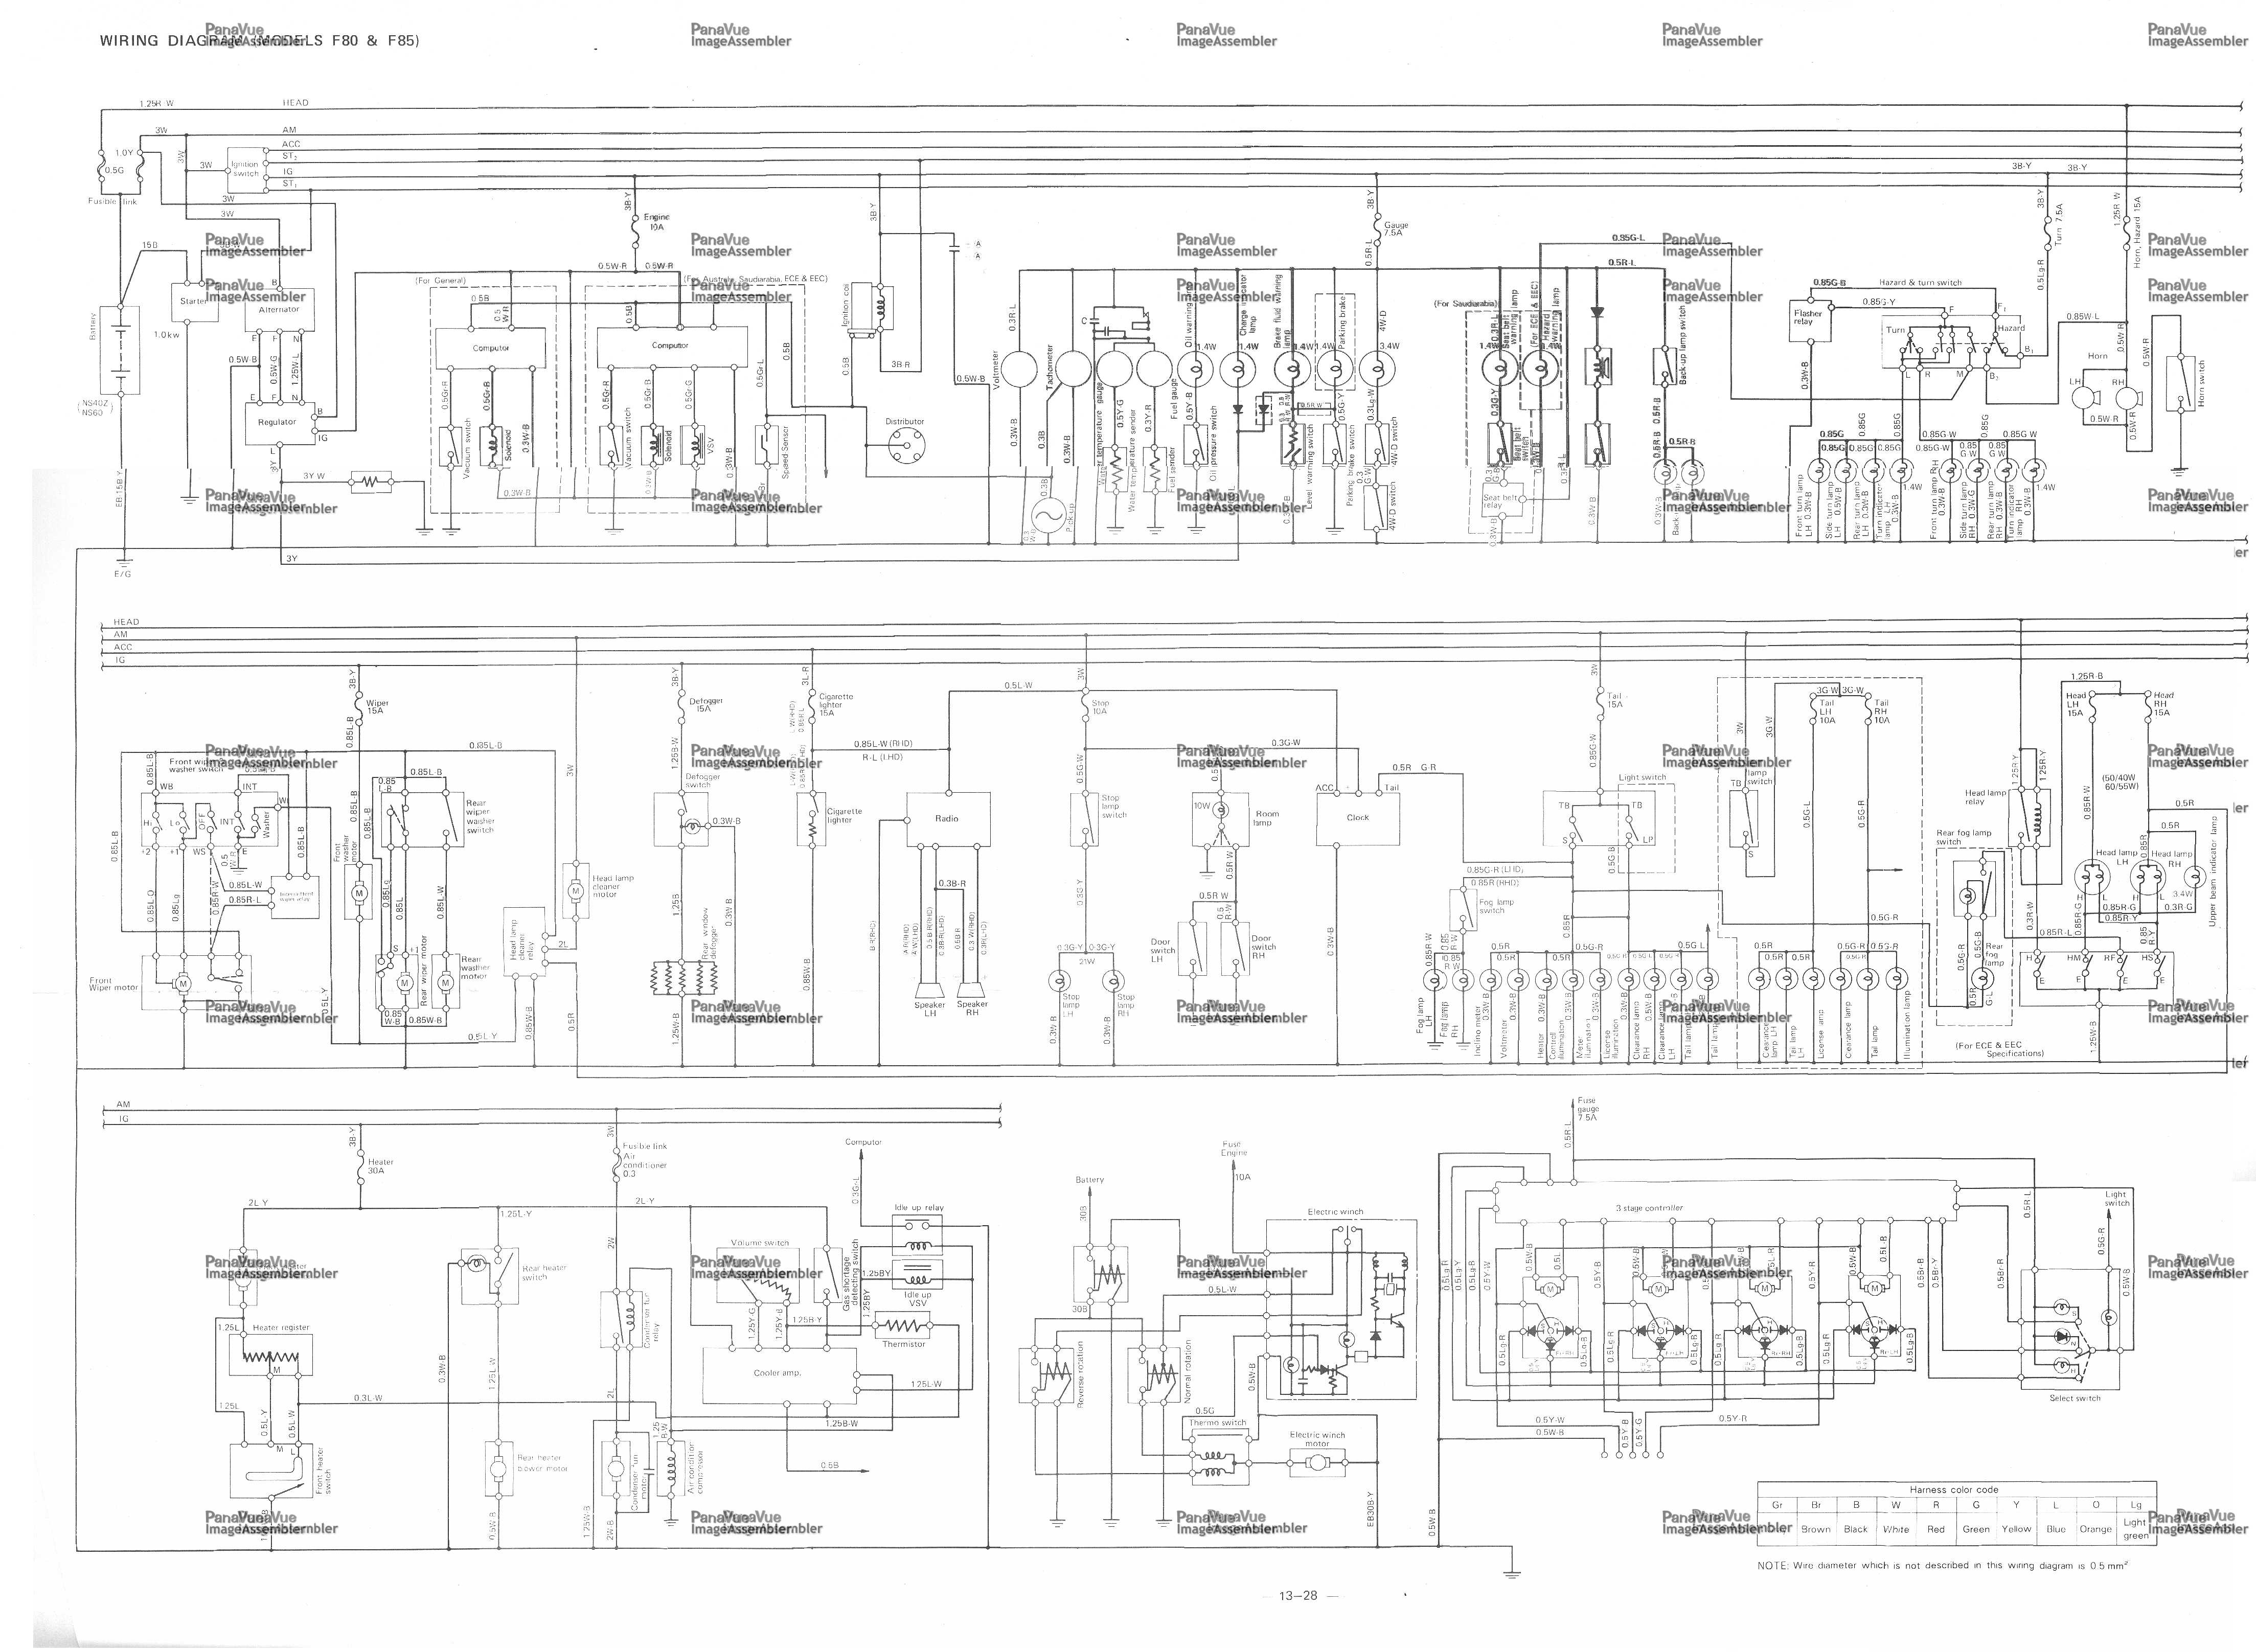 1998 Suzuki Swift Fuse Box Electrical Wiring Diagrams 98 Esteem Diagram 200